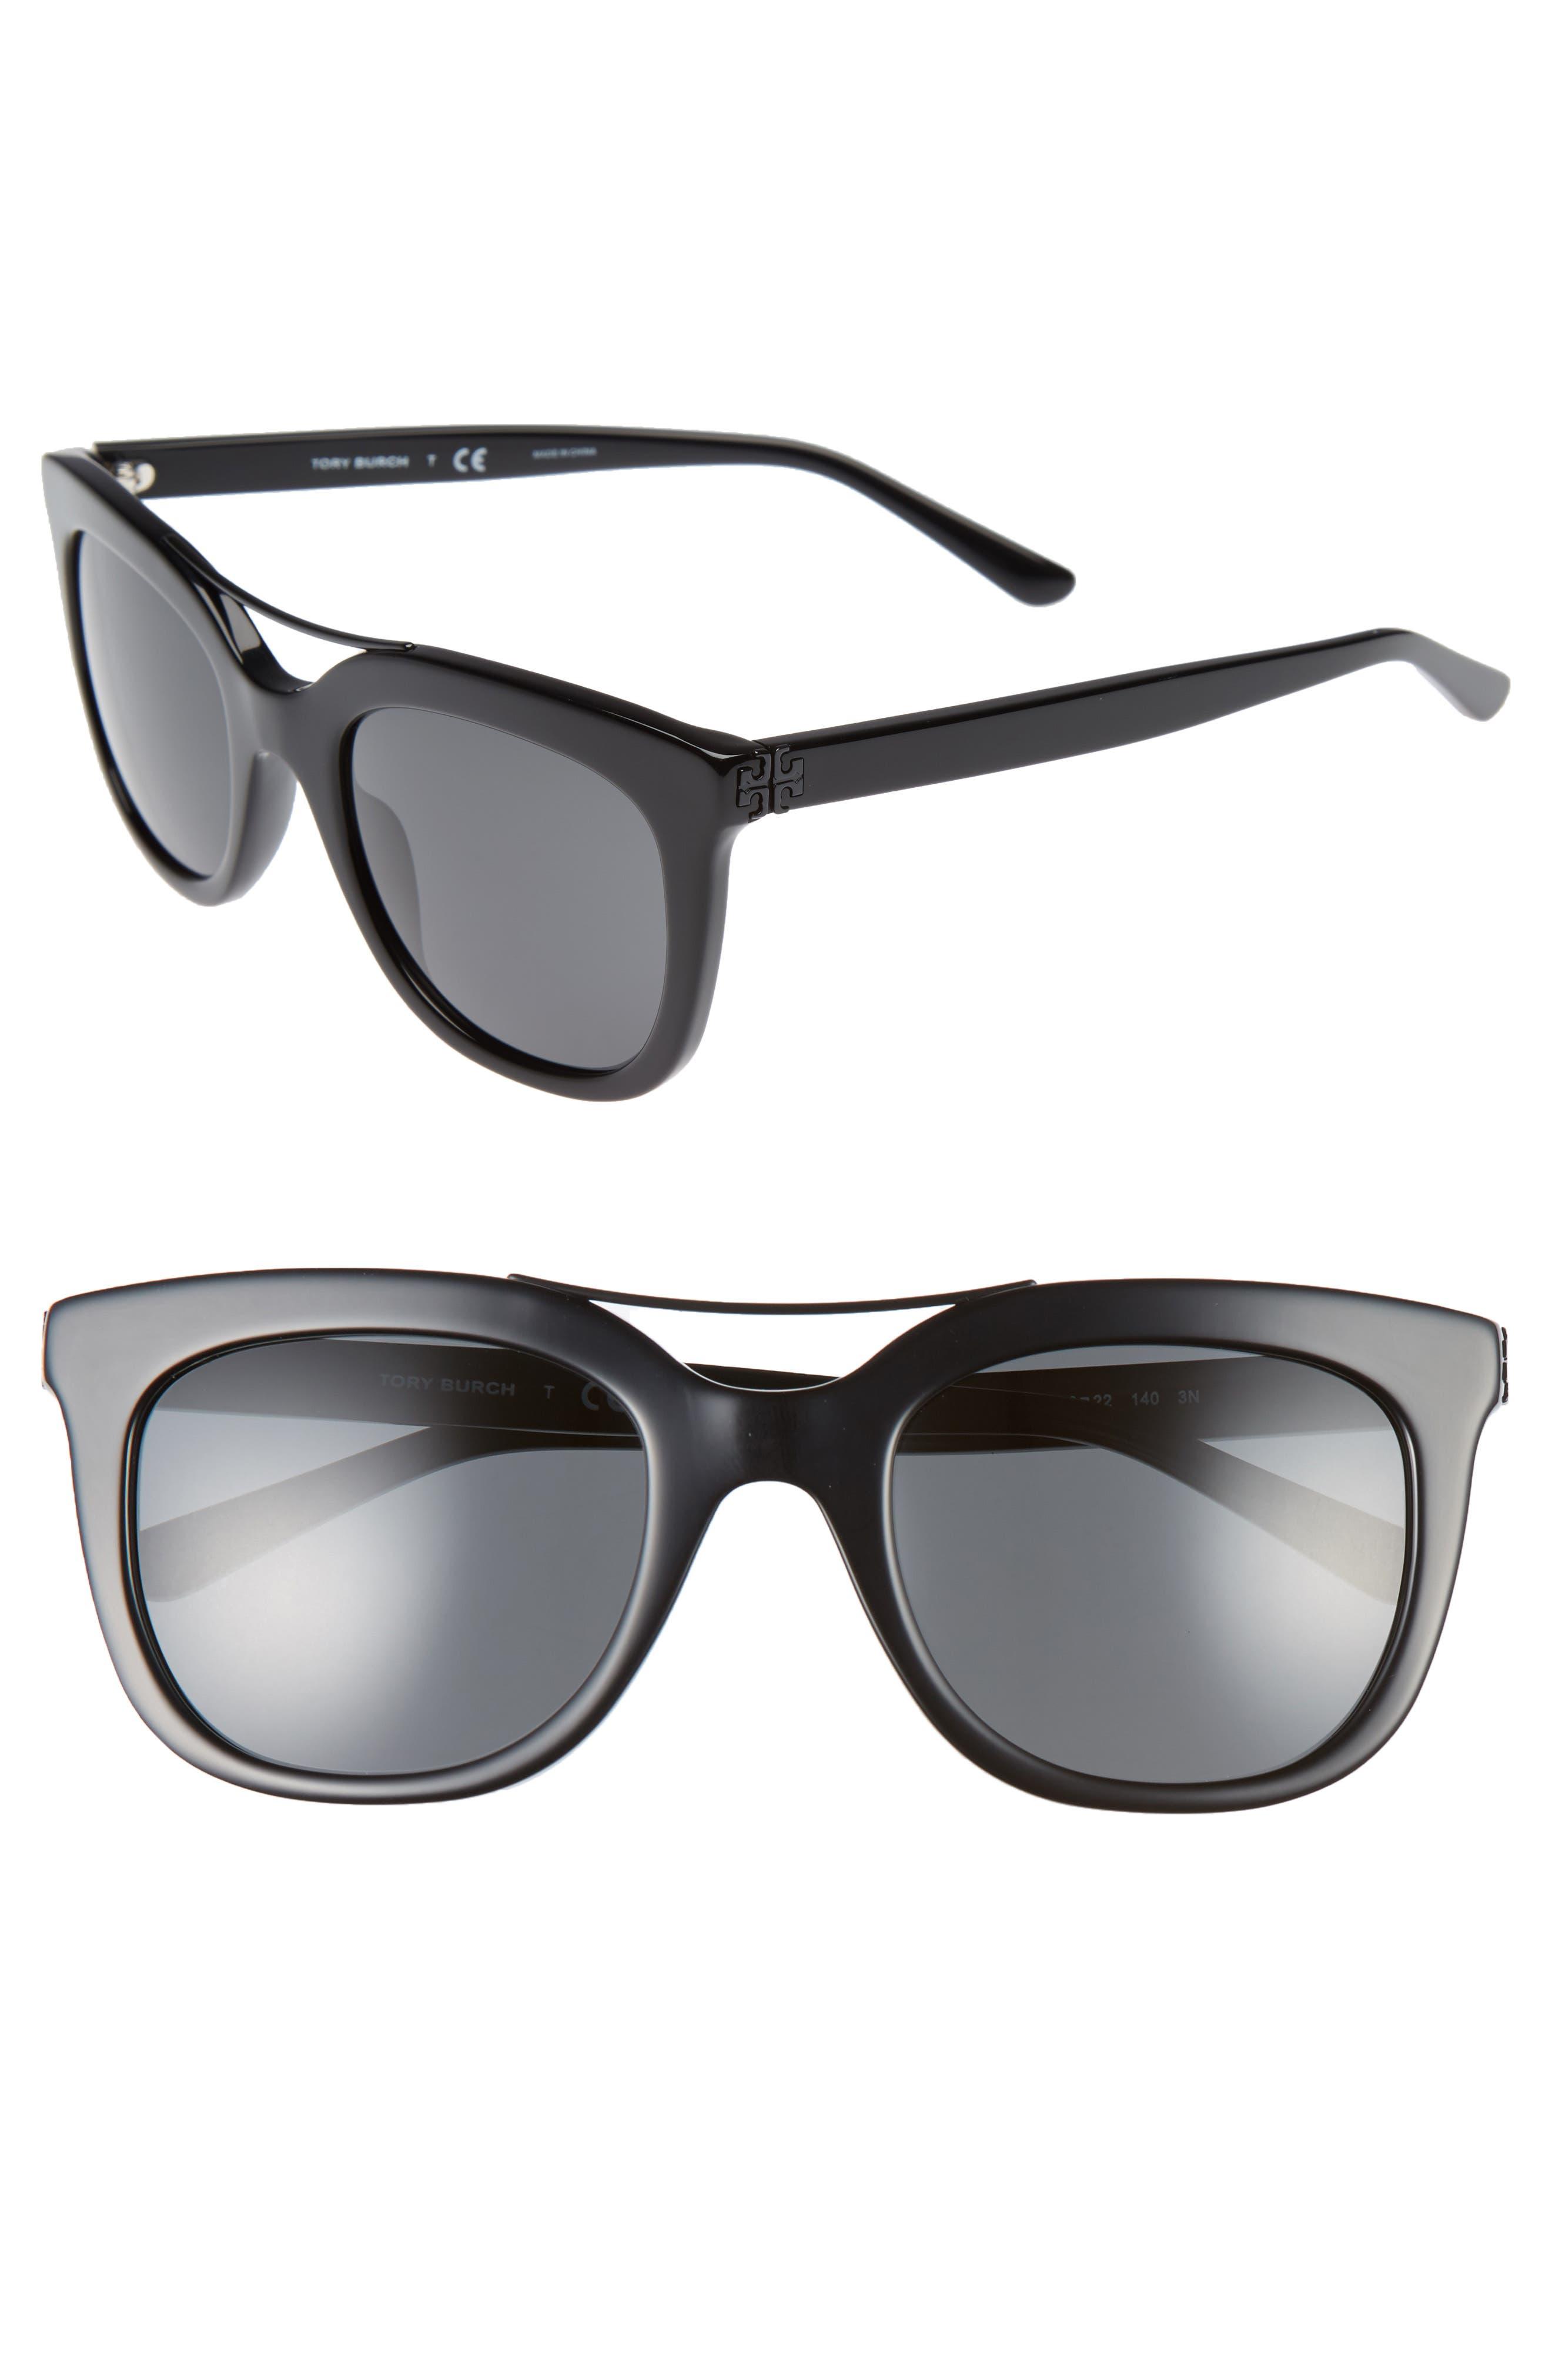 Tory Burch 53mm Retro Sunglasses